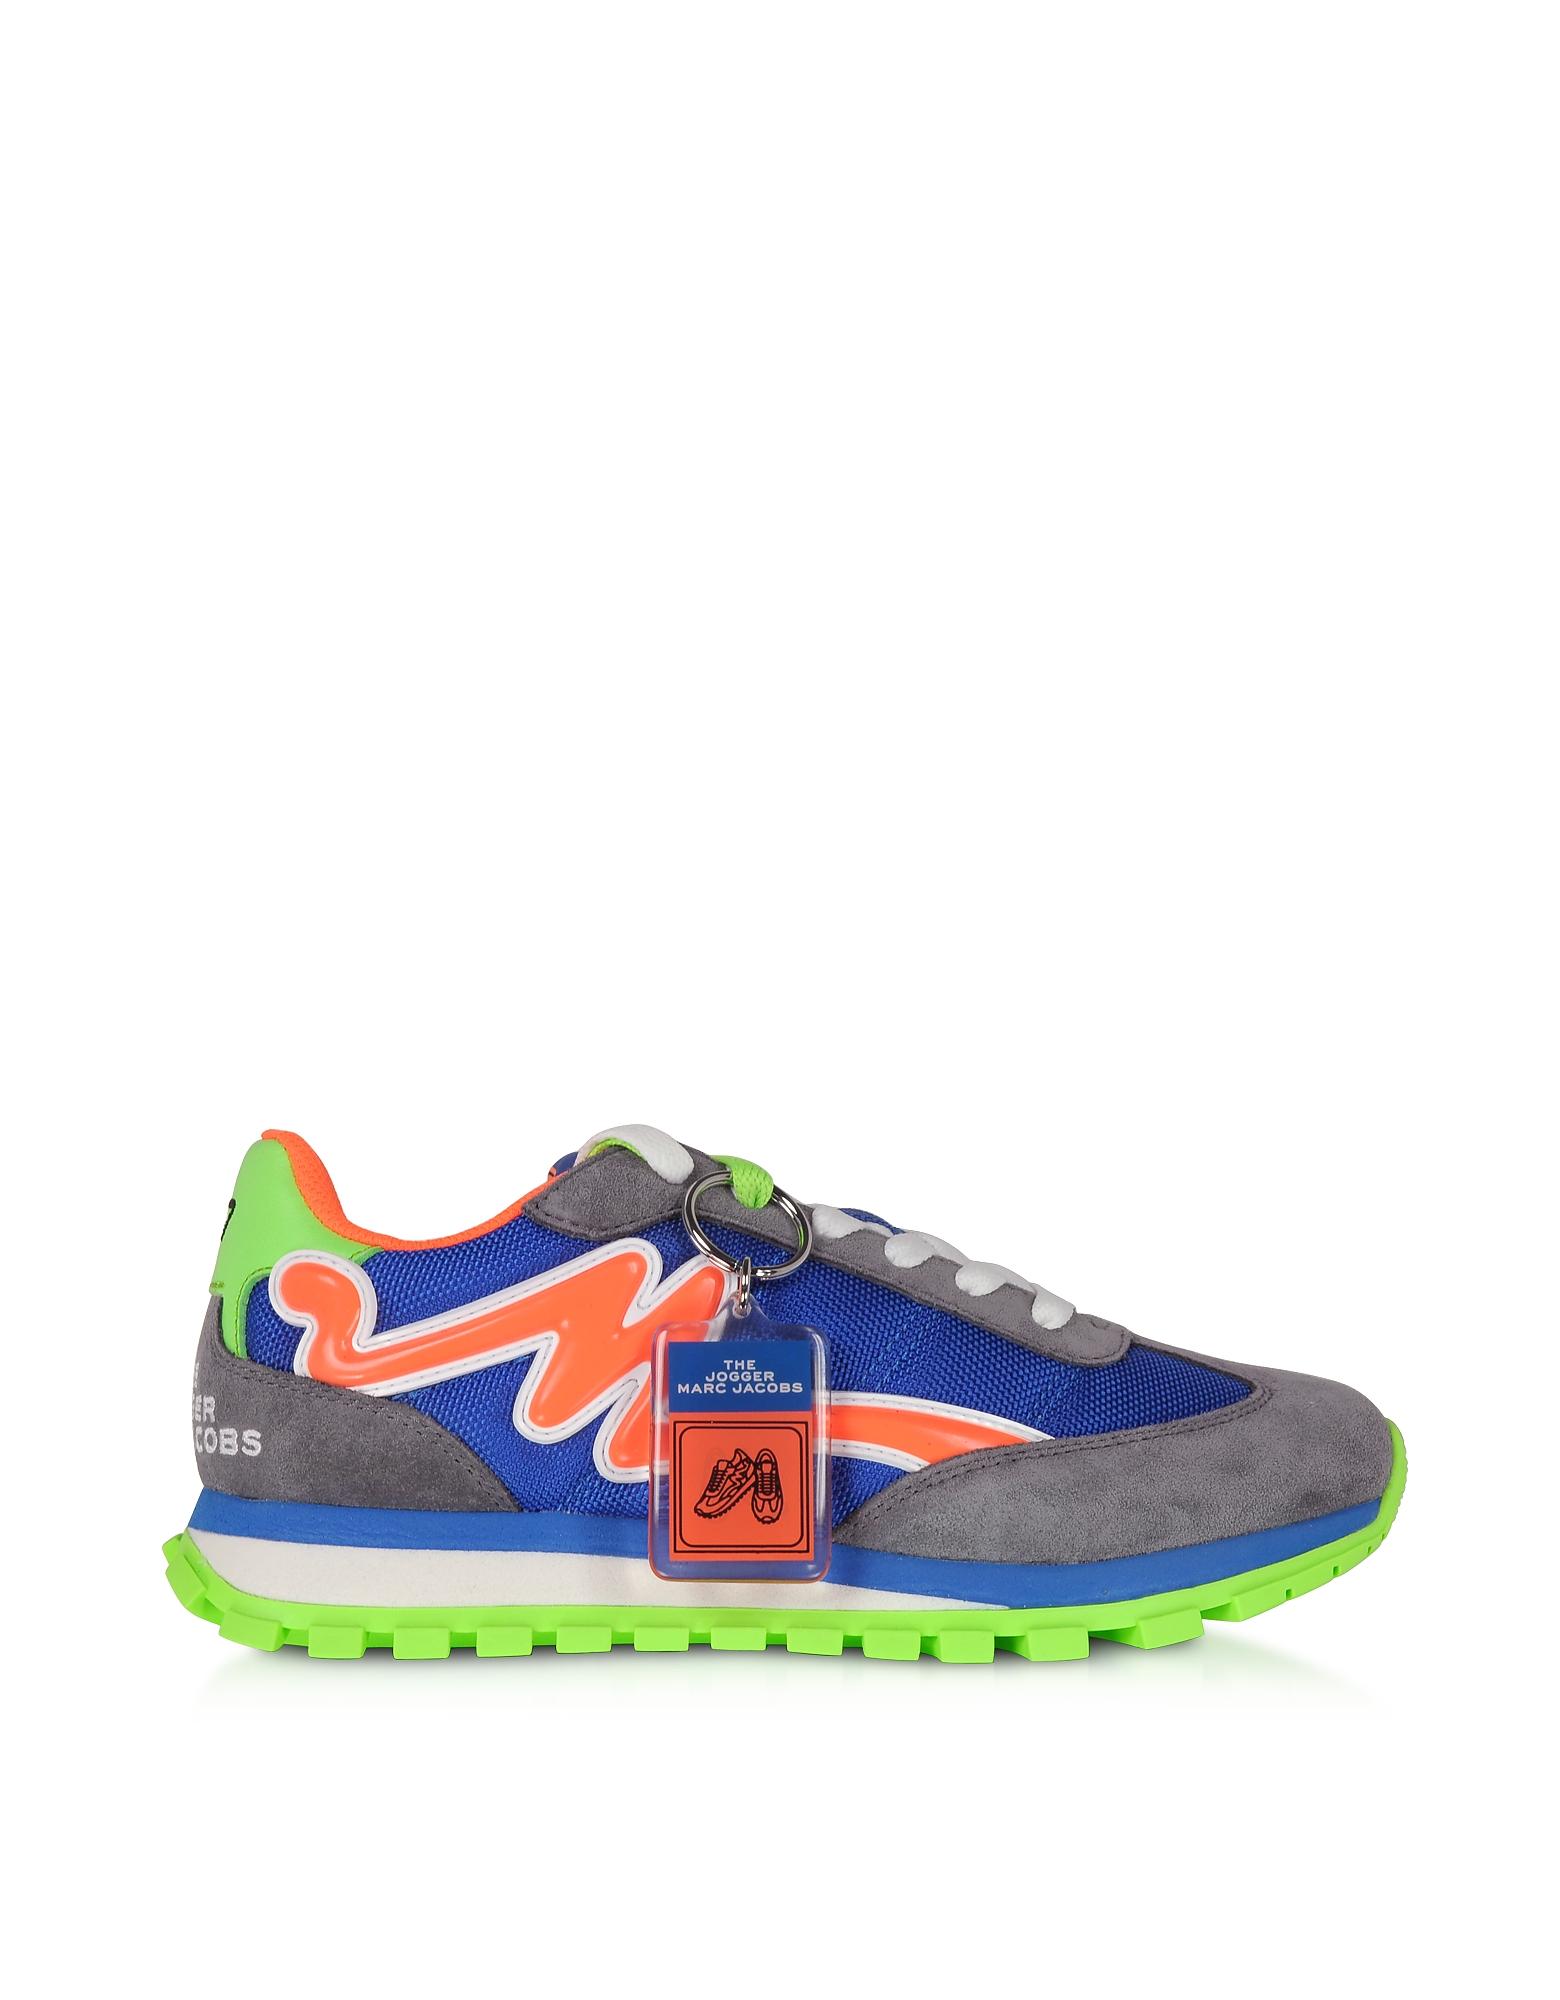 Marc Jacobs Designer Shoes, The Jogger Tangerine & Blue Nylon Women's Sneakers